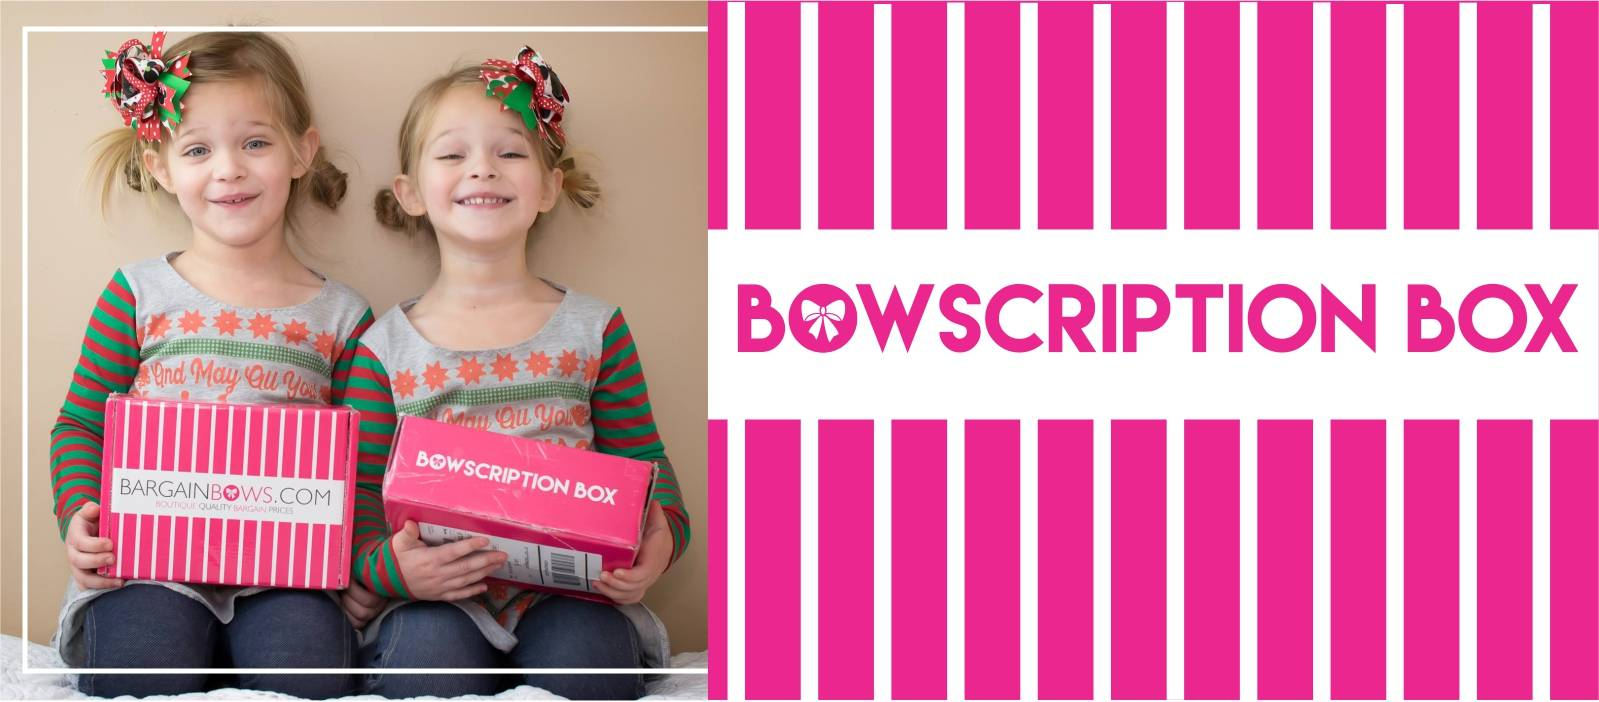 Bowscription Box